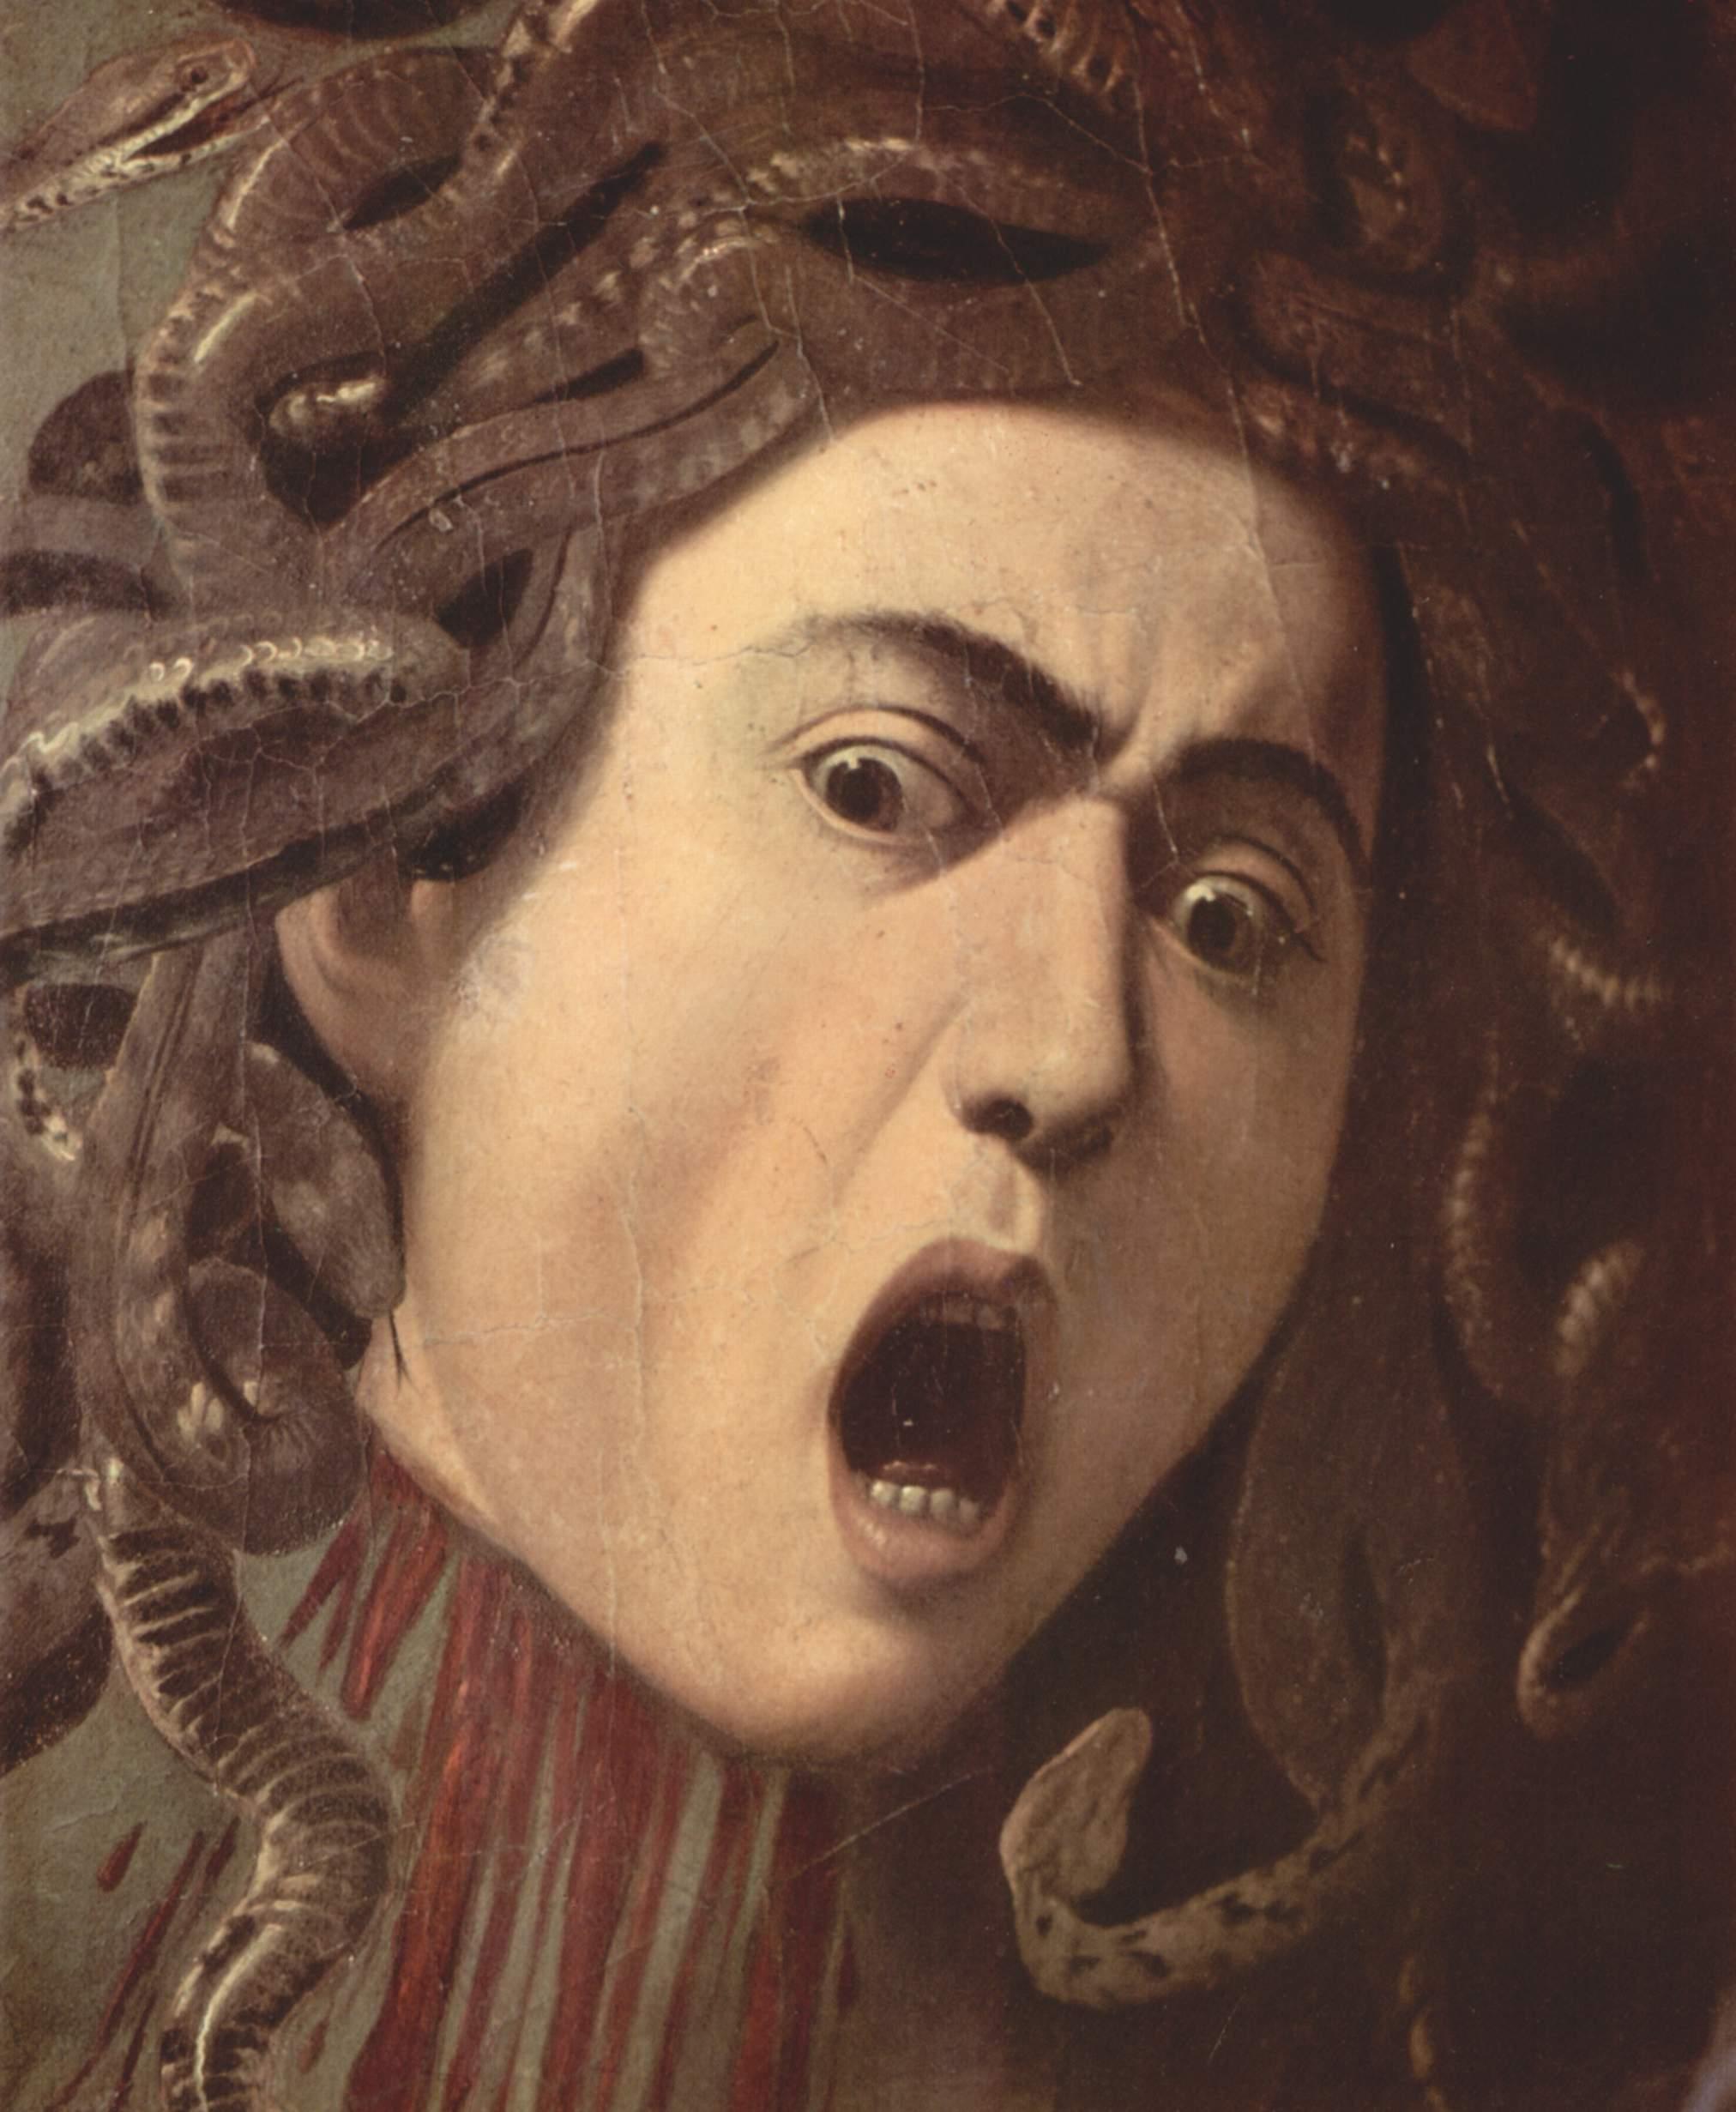 Голова Медузы. Деталь, Микеланджело Меризи де Караваджо